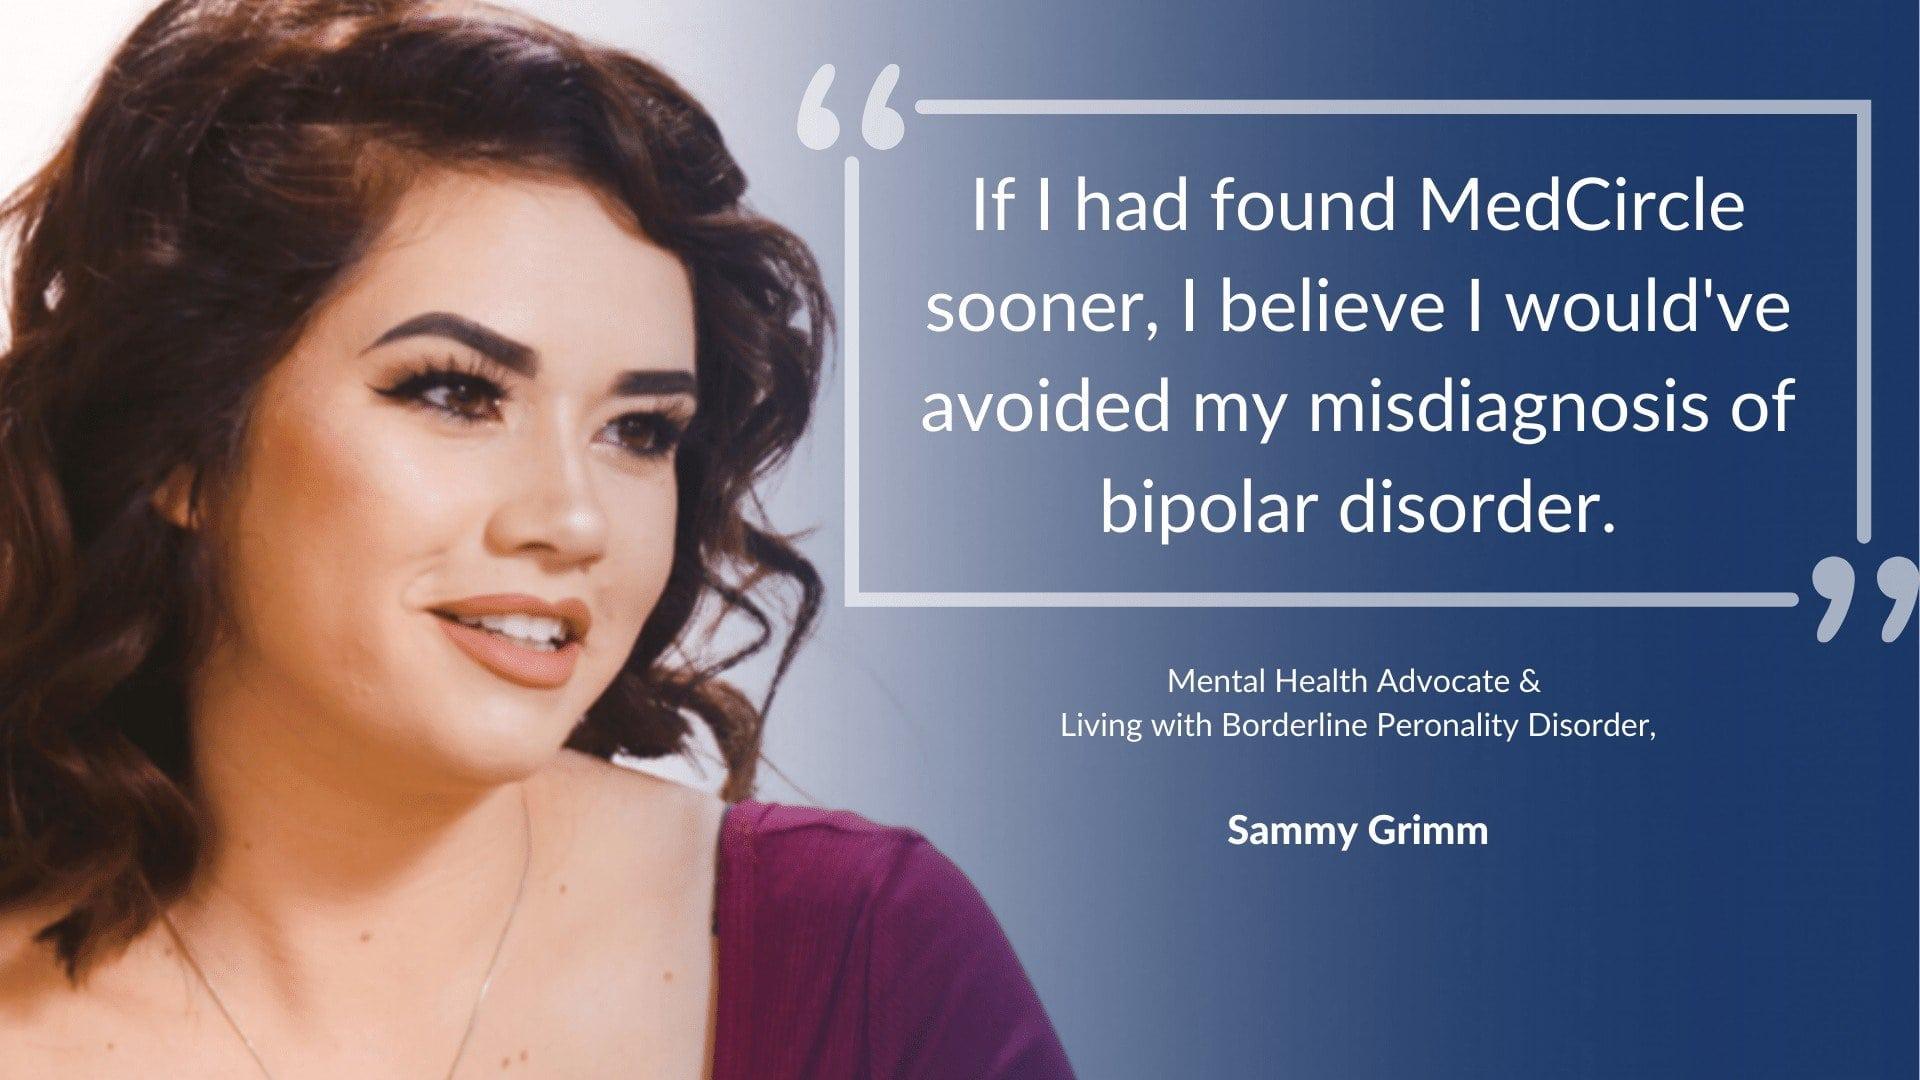 MedCircle for mental health patients